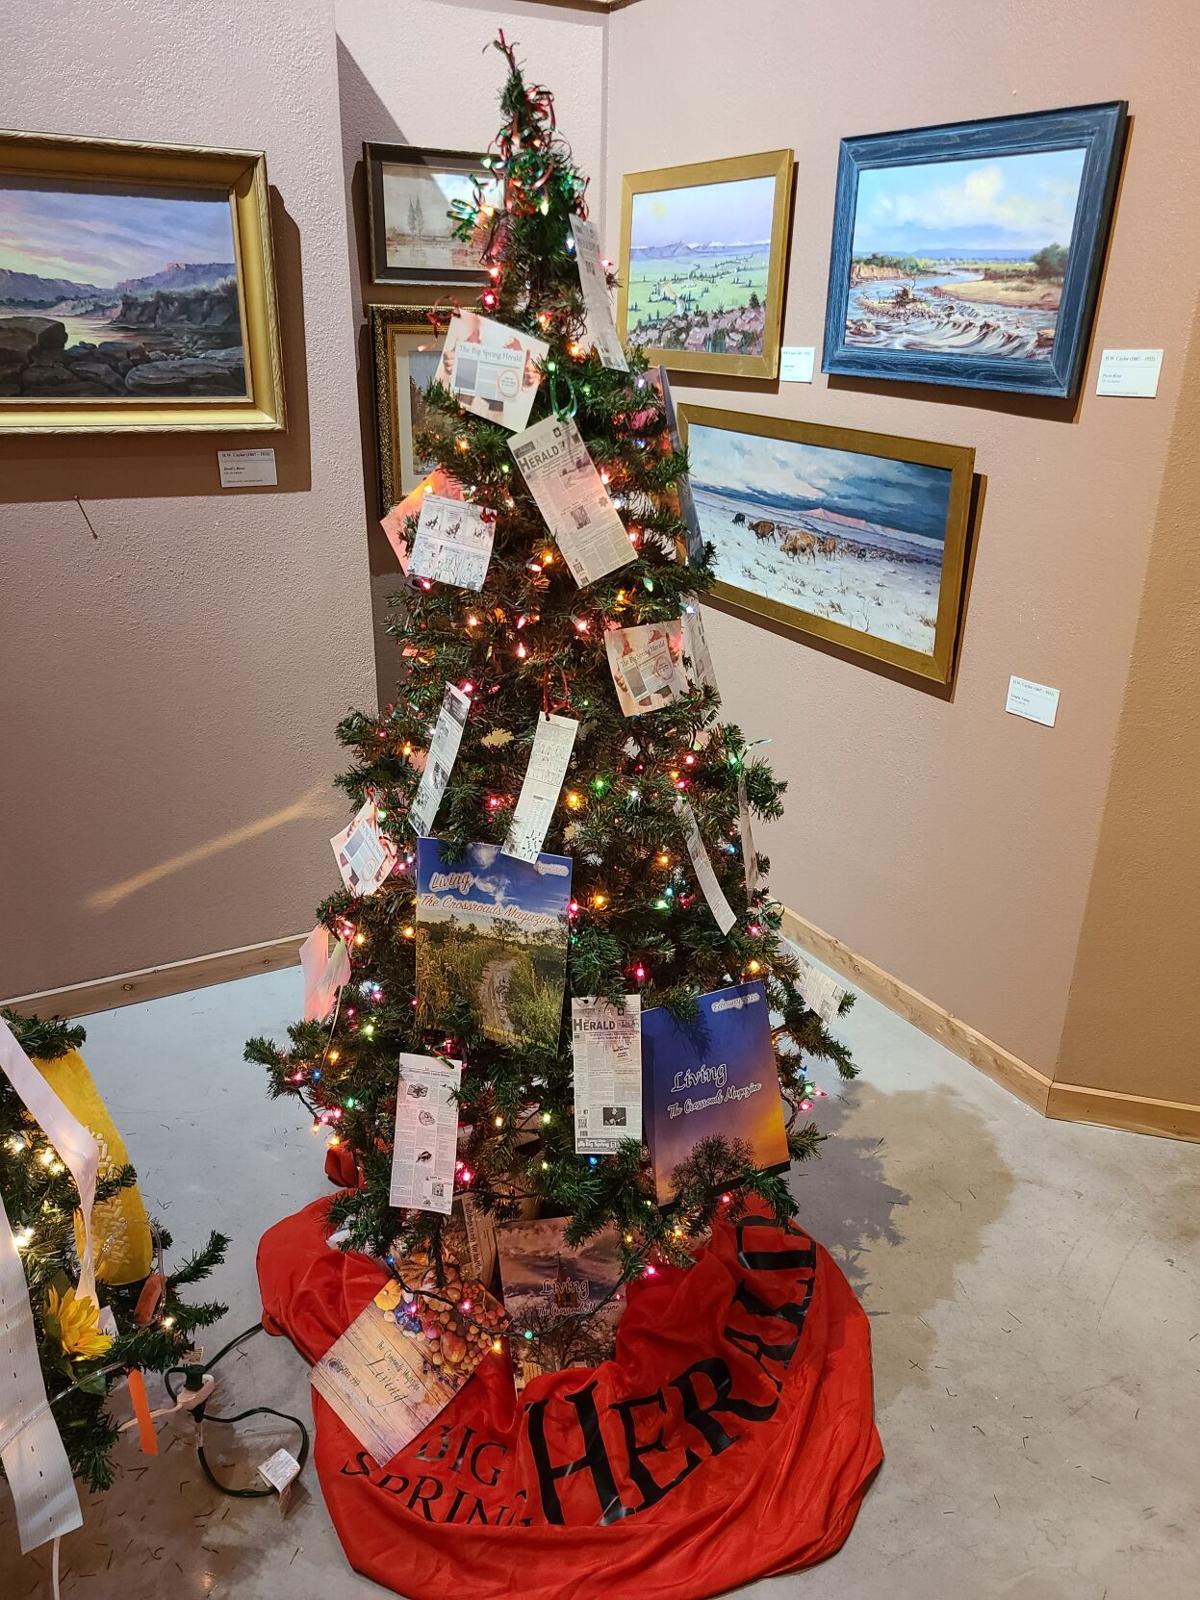 Herald tree